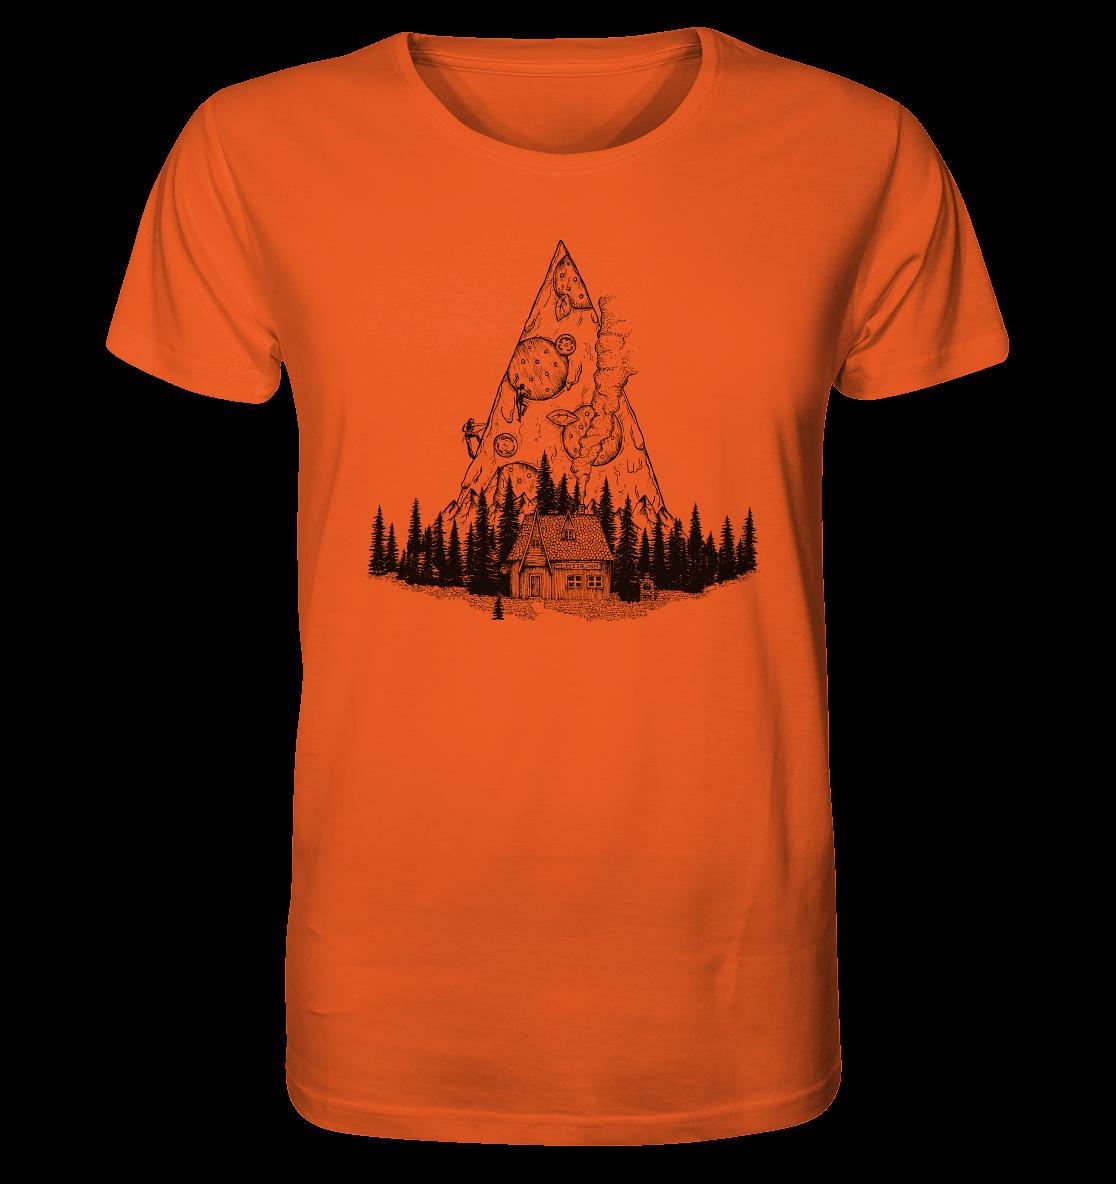 front-organic-shirt-ea5b23-1116x-11.png